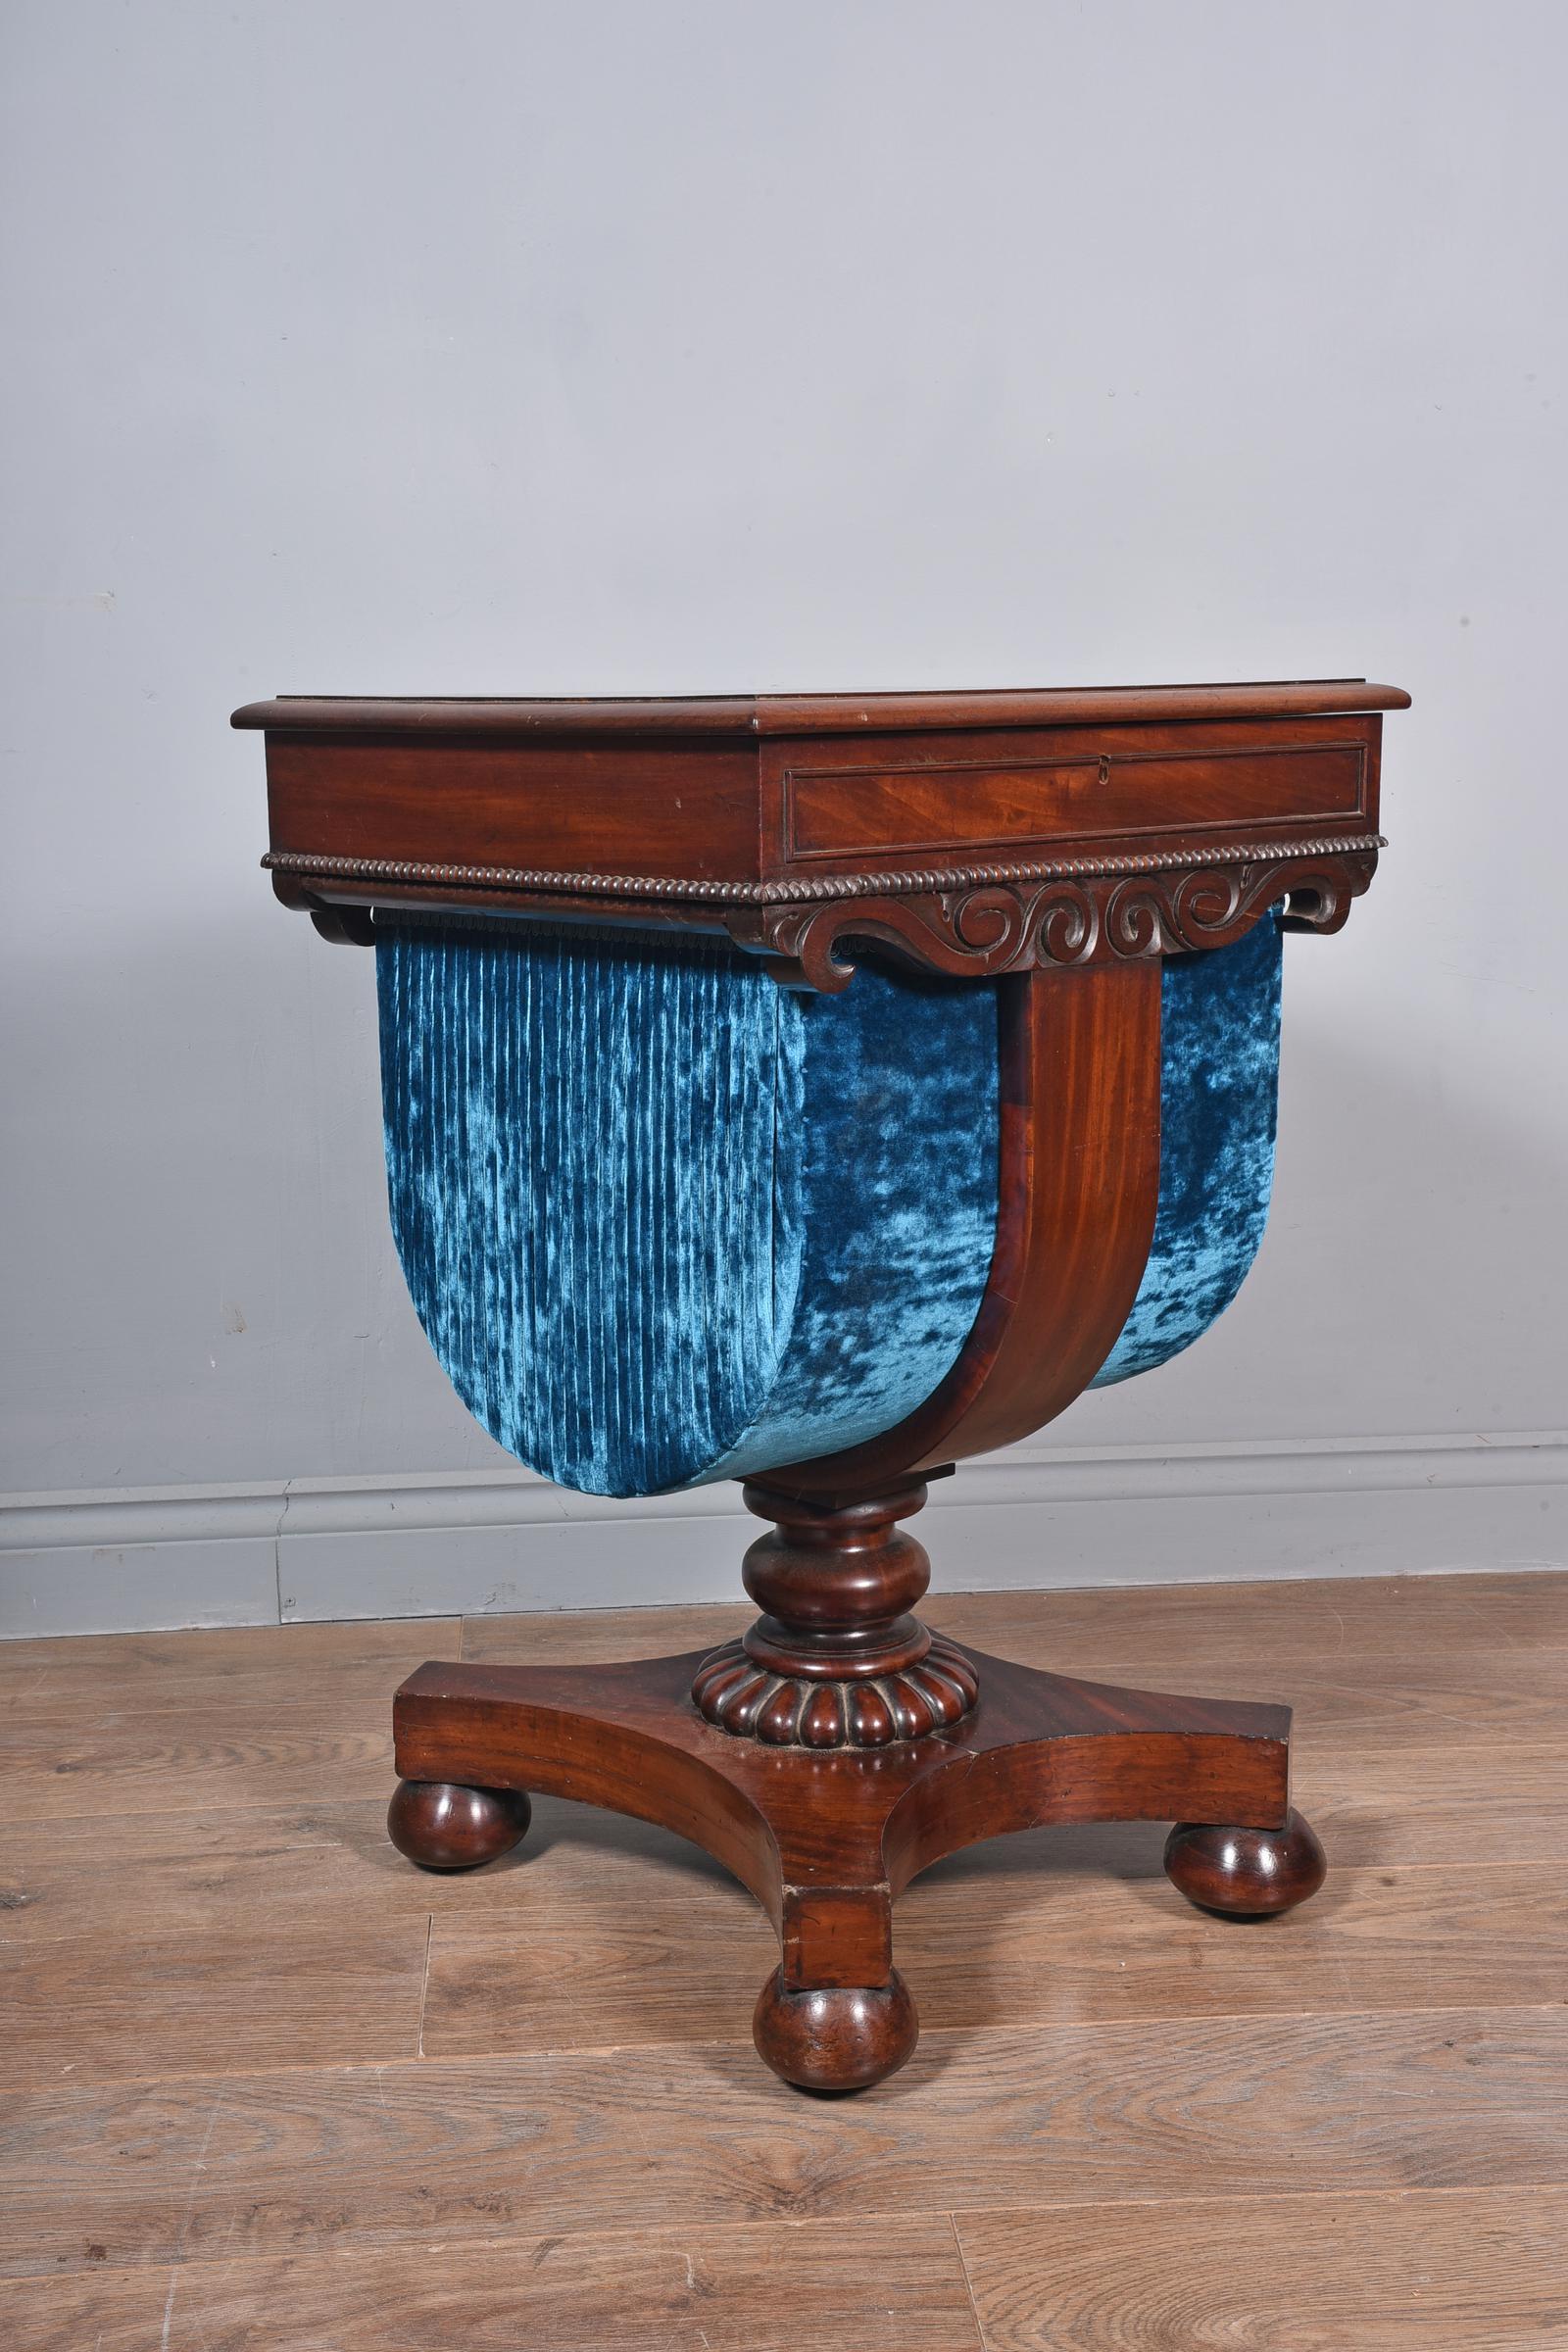 Regency mahogany work table lamp table (1 of 1)